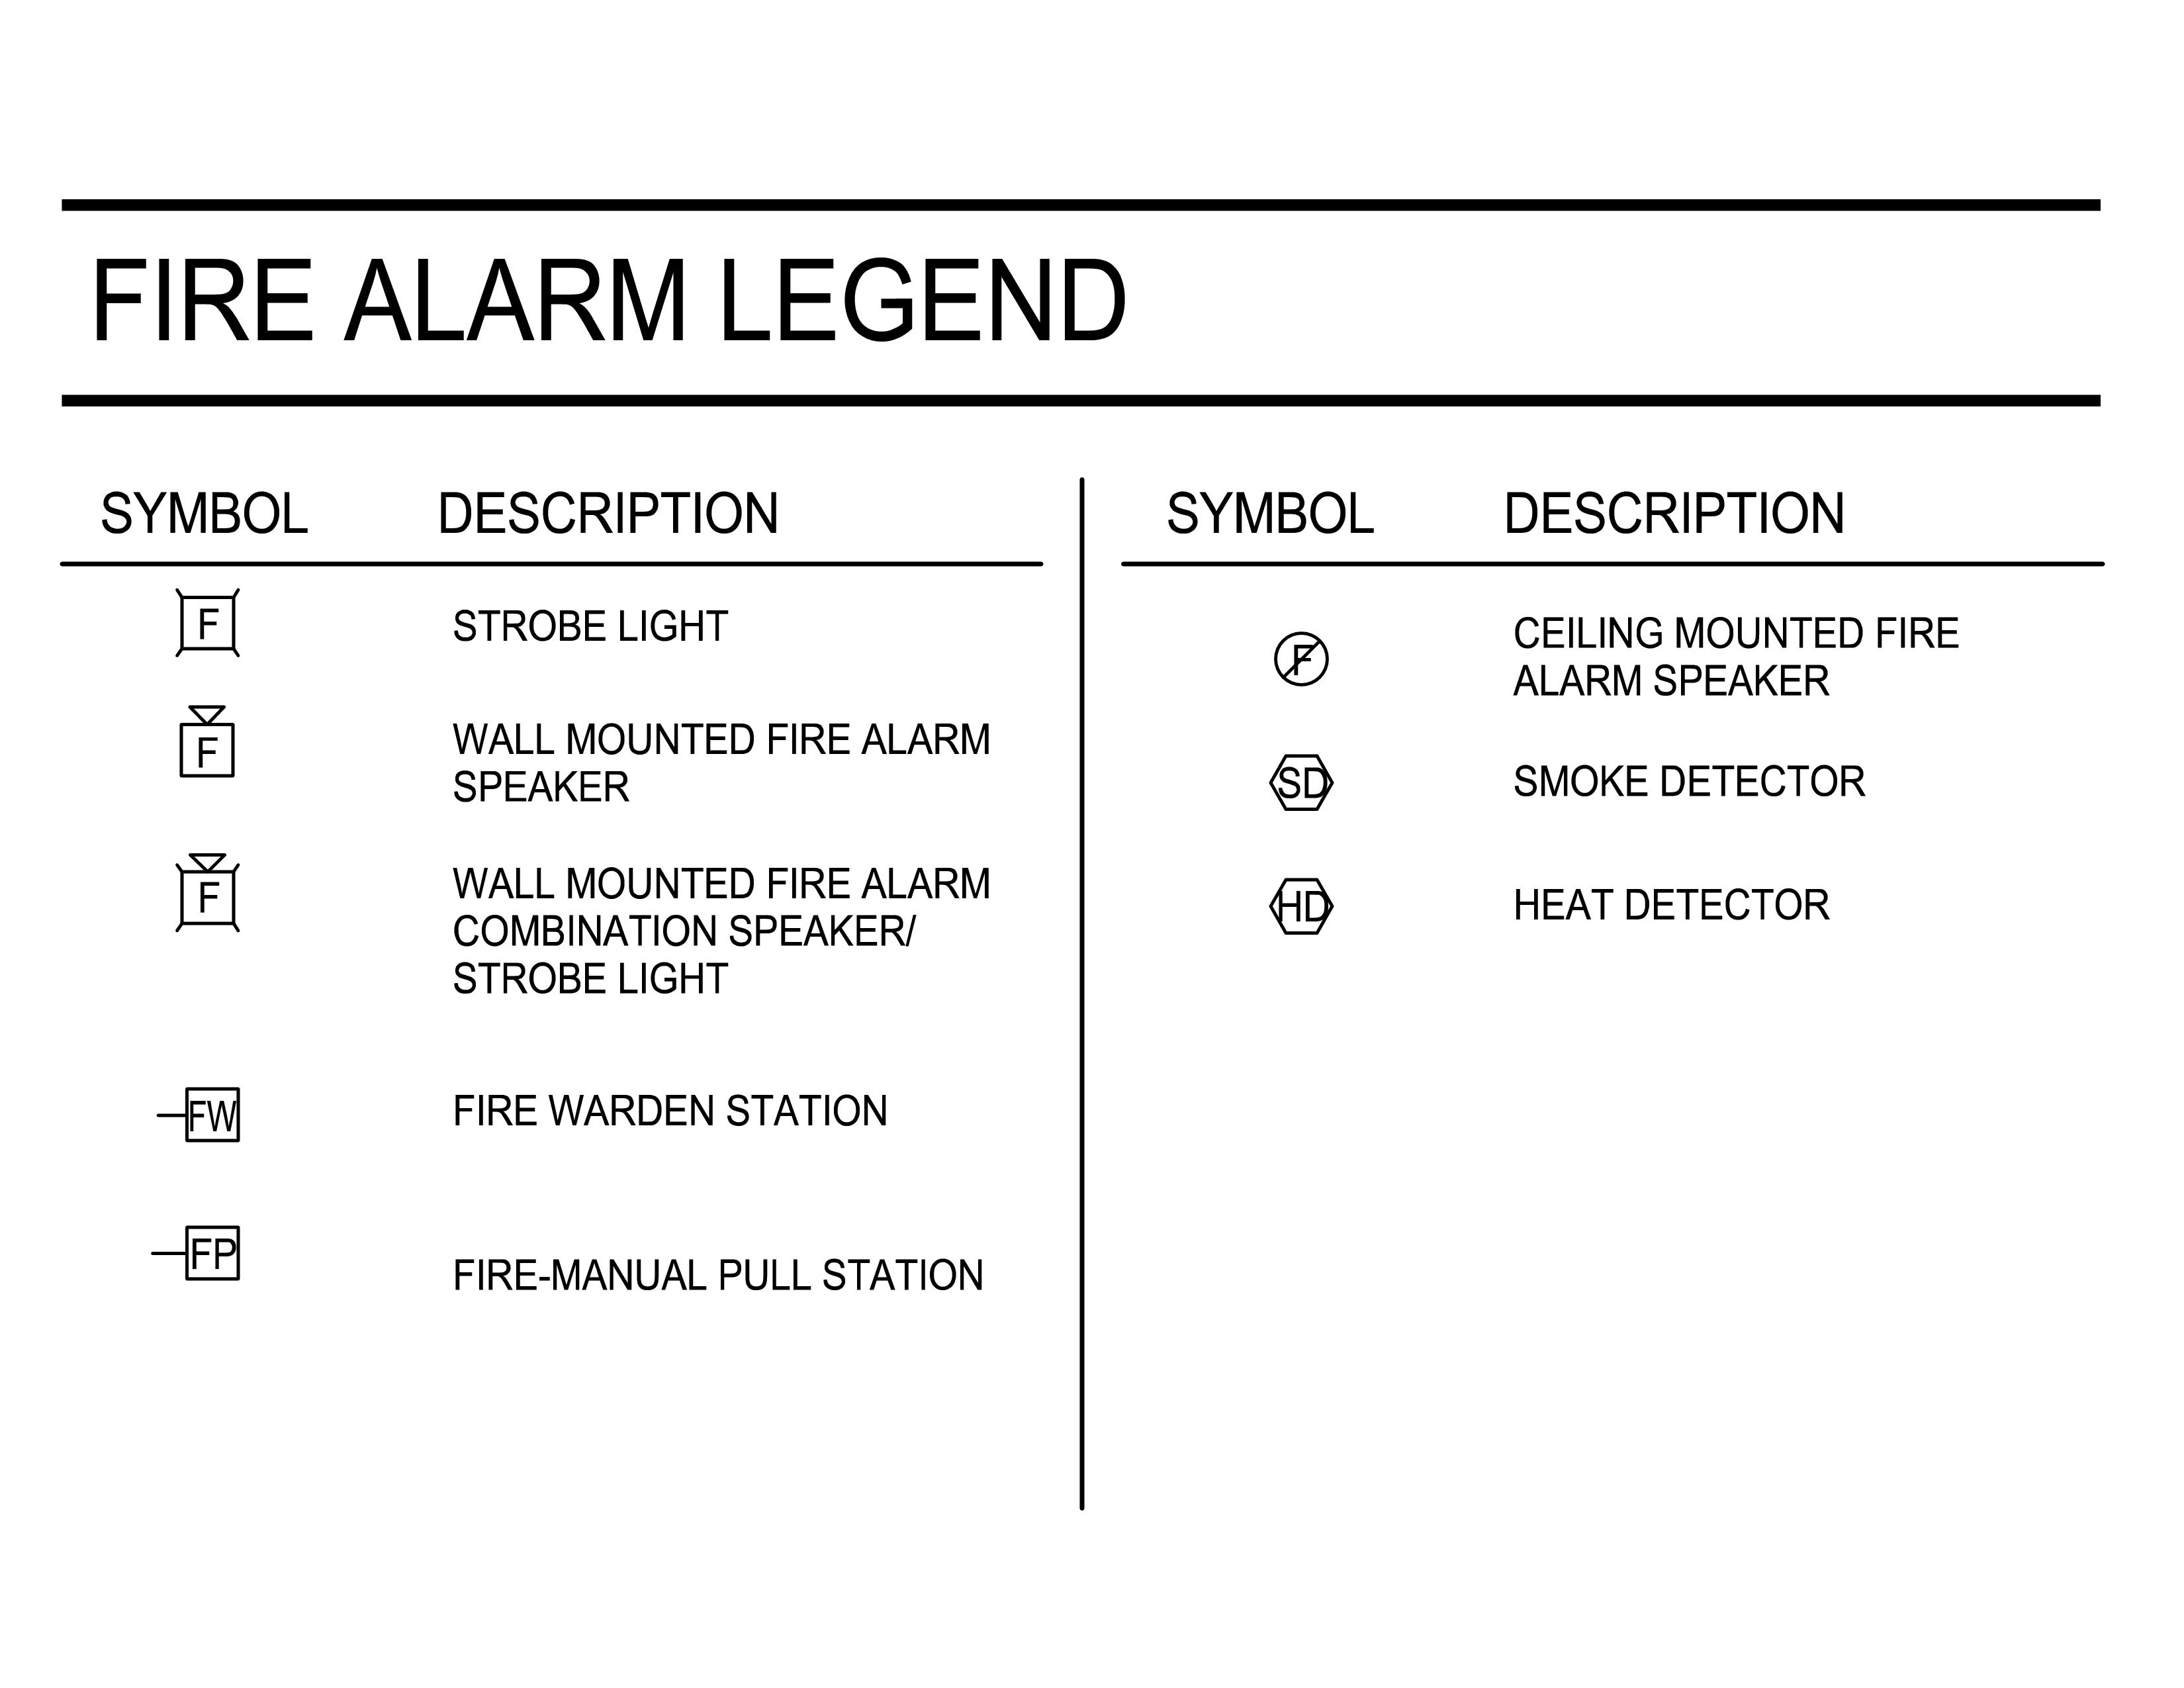 medium resolution of fire alarm legend architecture details boarding pass